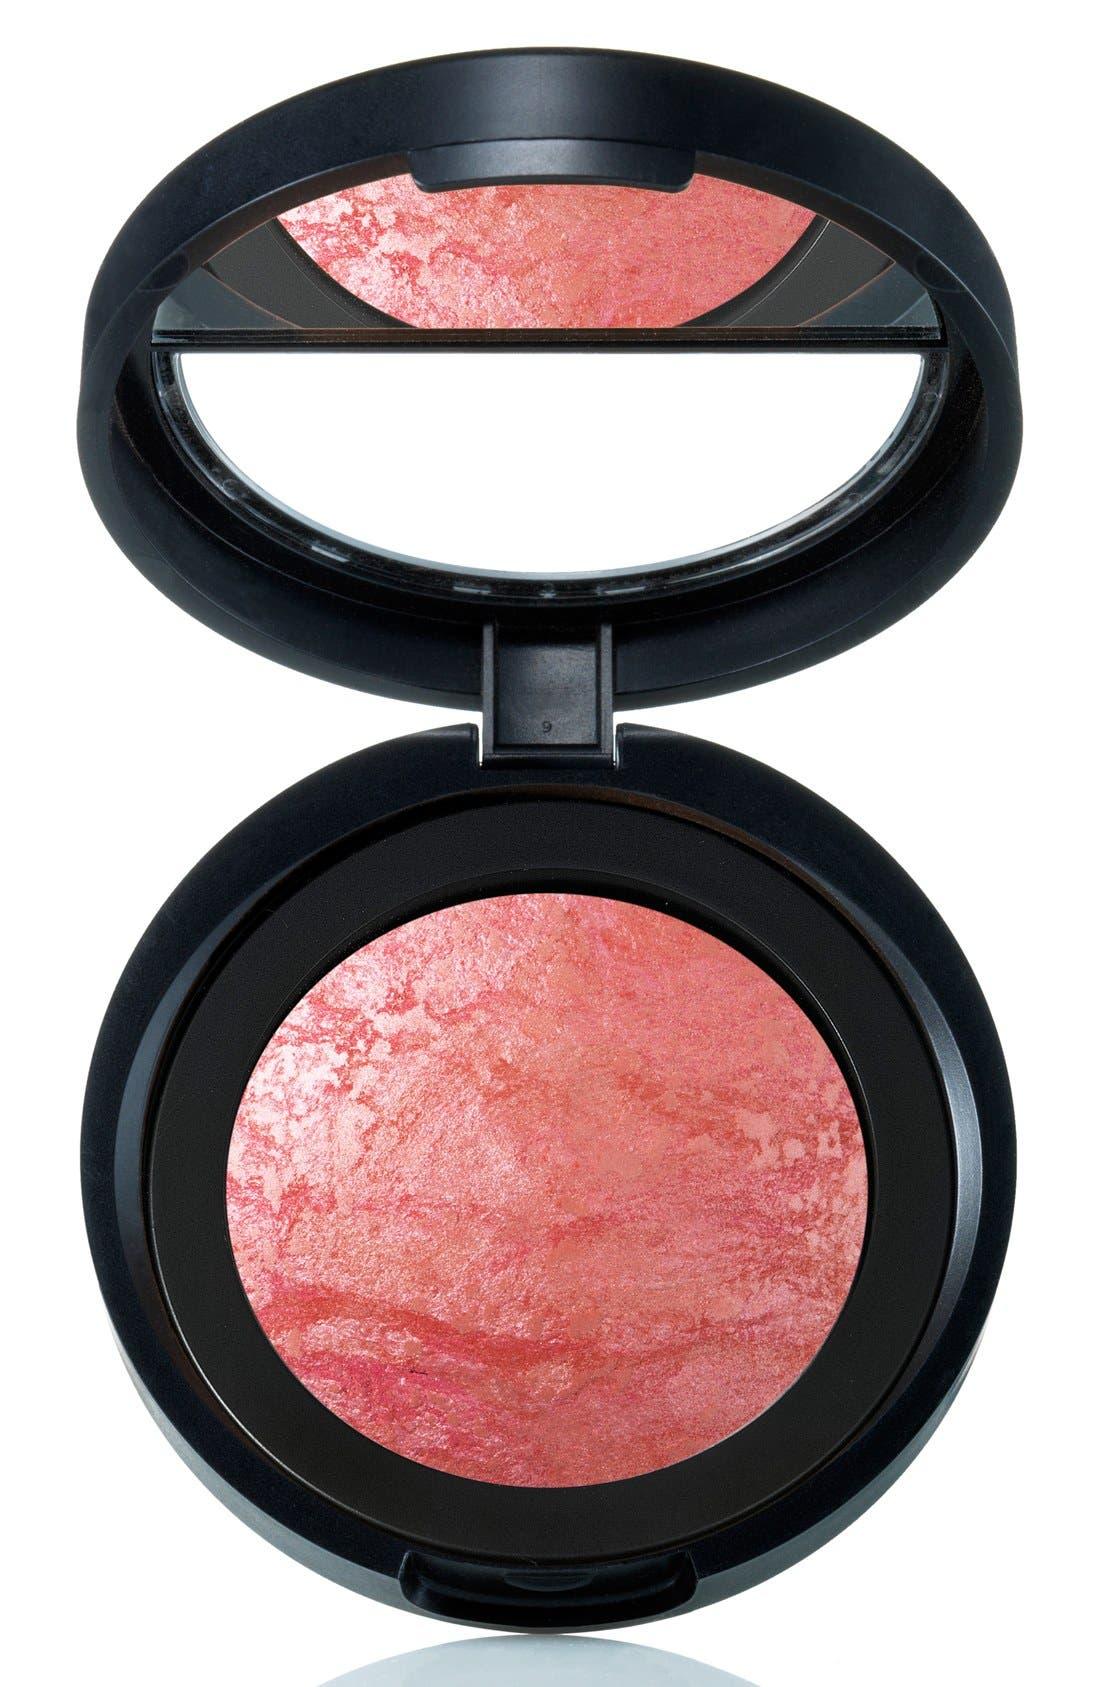 Laura Geller Beauty 'Blush-n-Brighten' Baked Blush